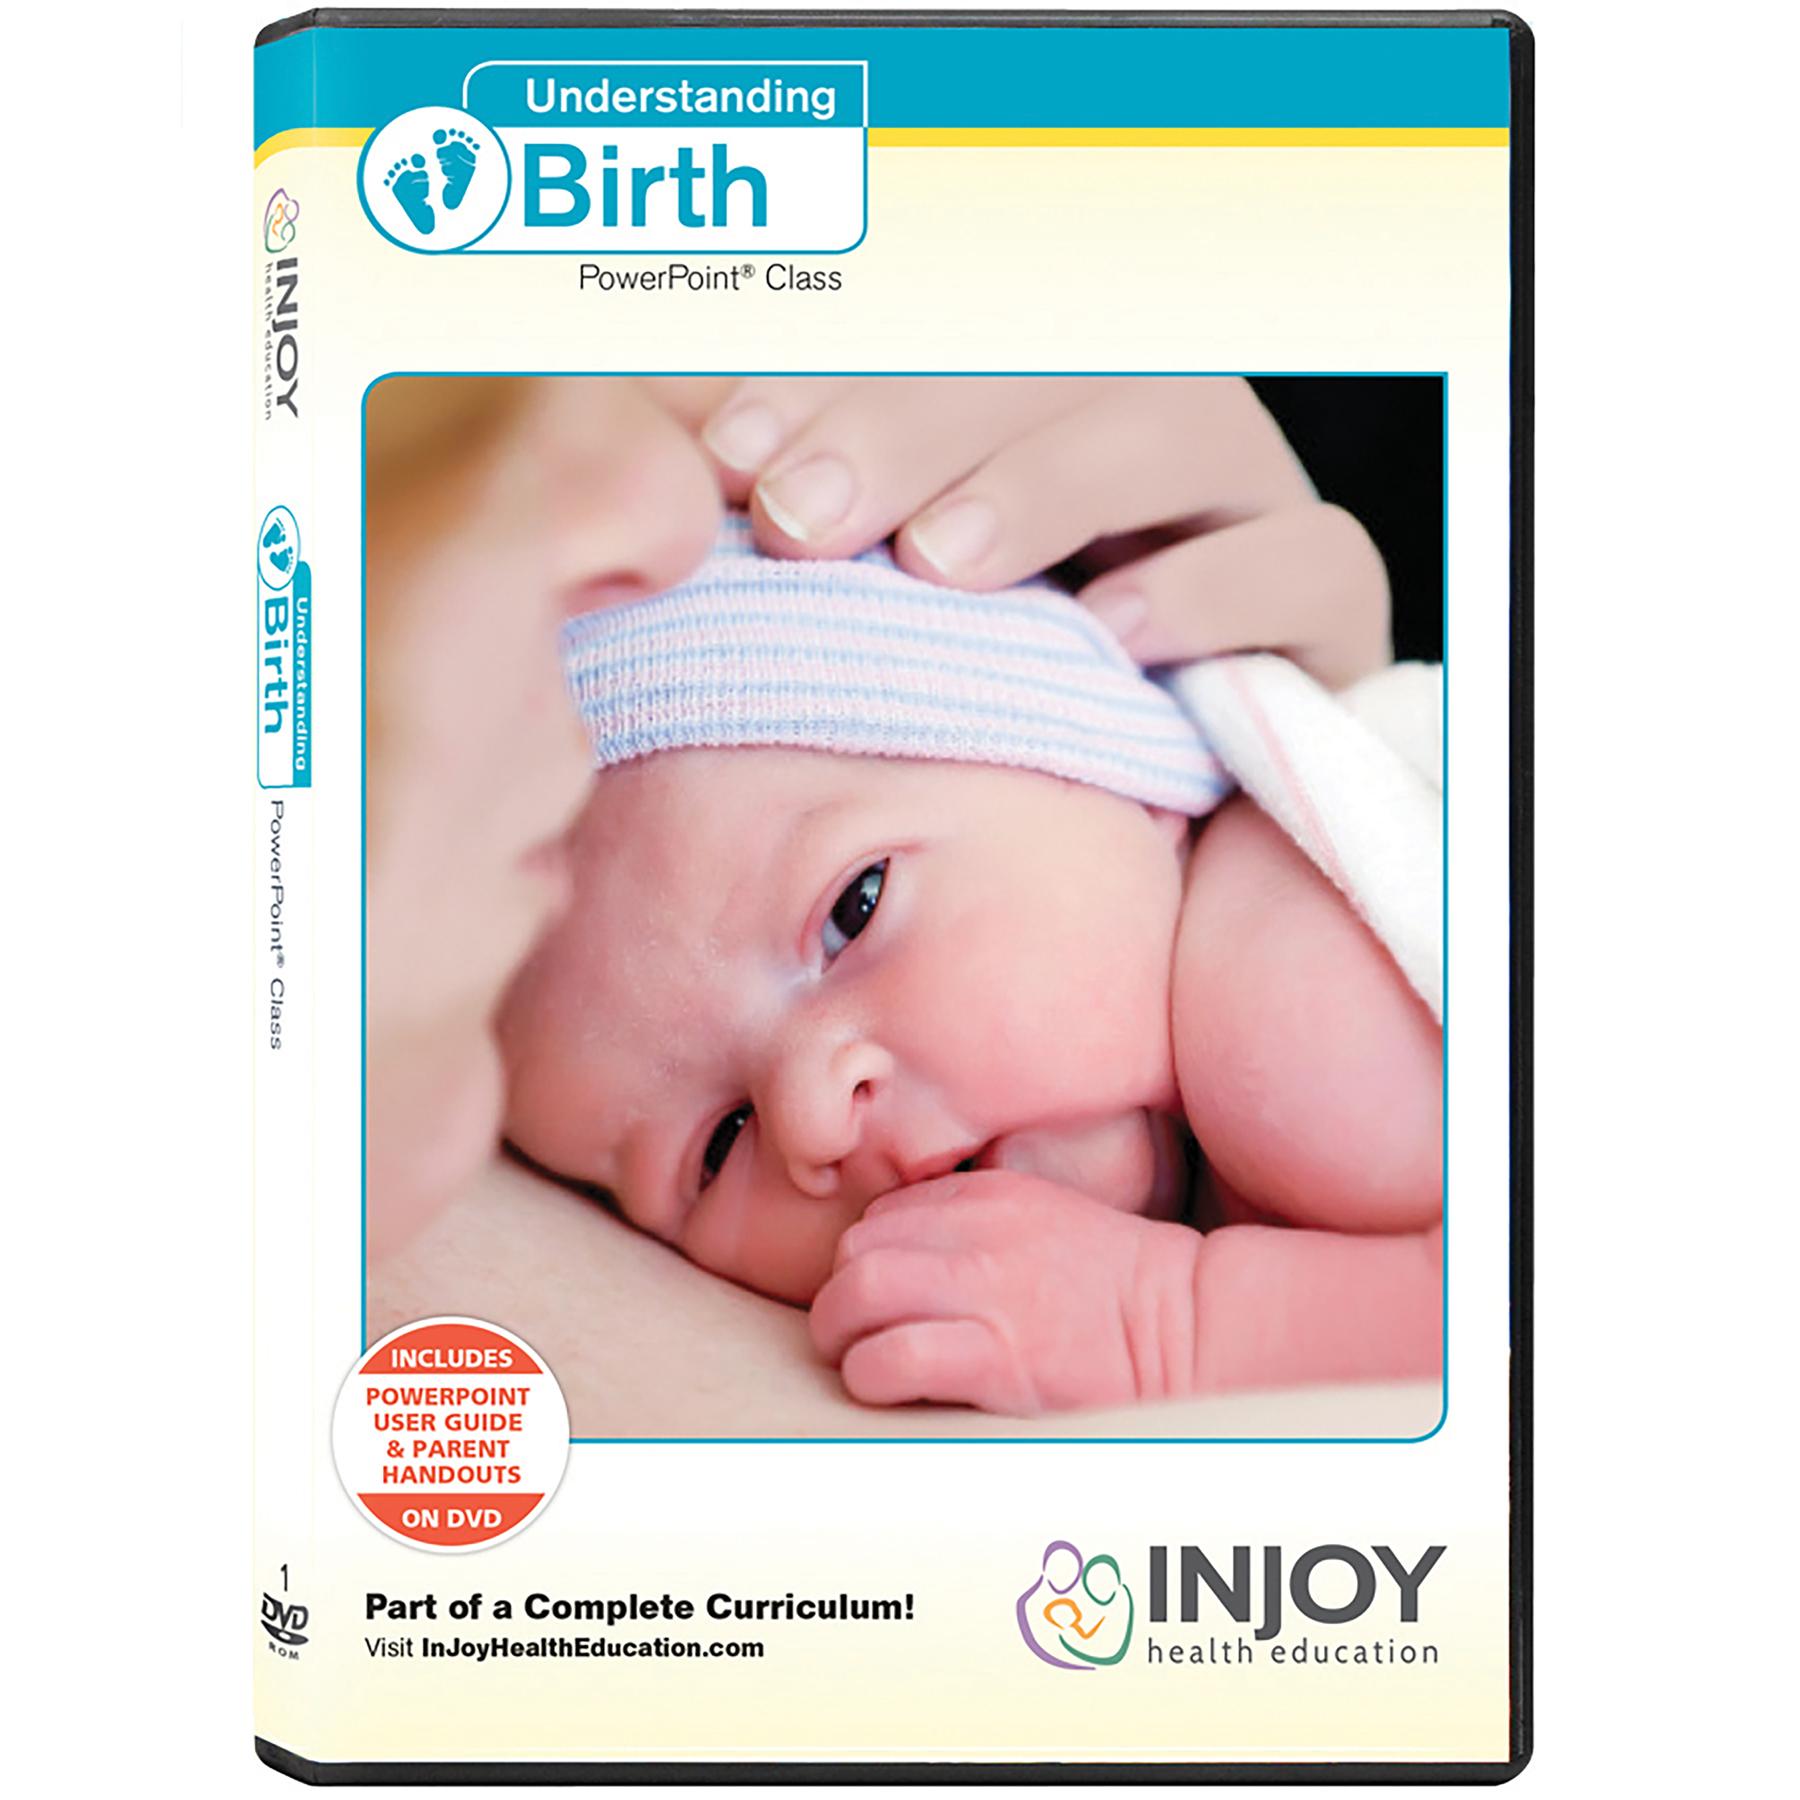 Understanding Birth PowerPoint Class DVD cover newborn striped cap skin to skin, Childbirth Graphics, 48854